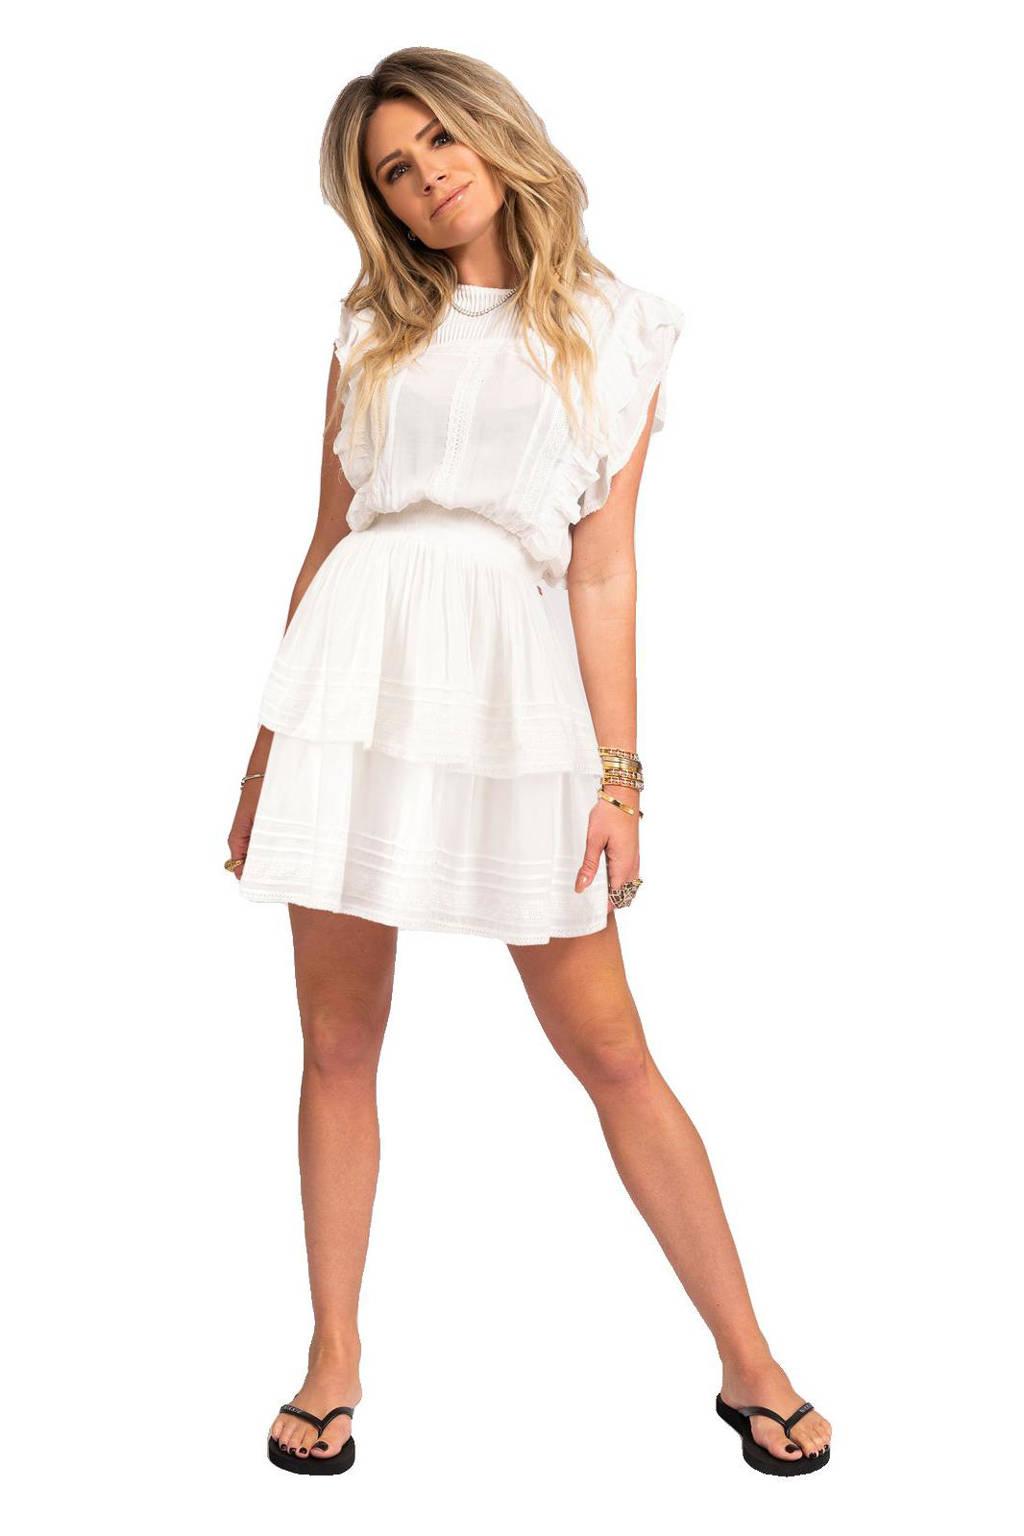 NIKKIE jurk Samiya met kant gebroken wit, Gebroken wit